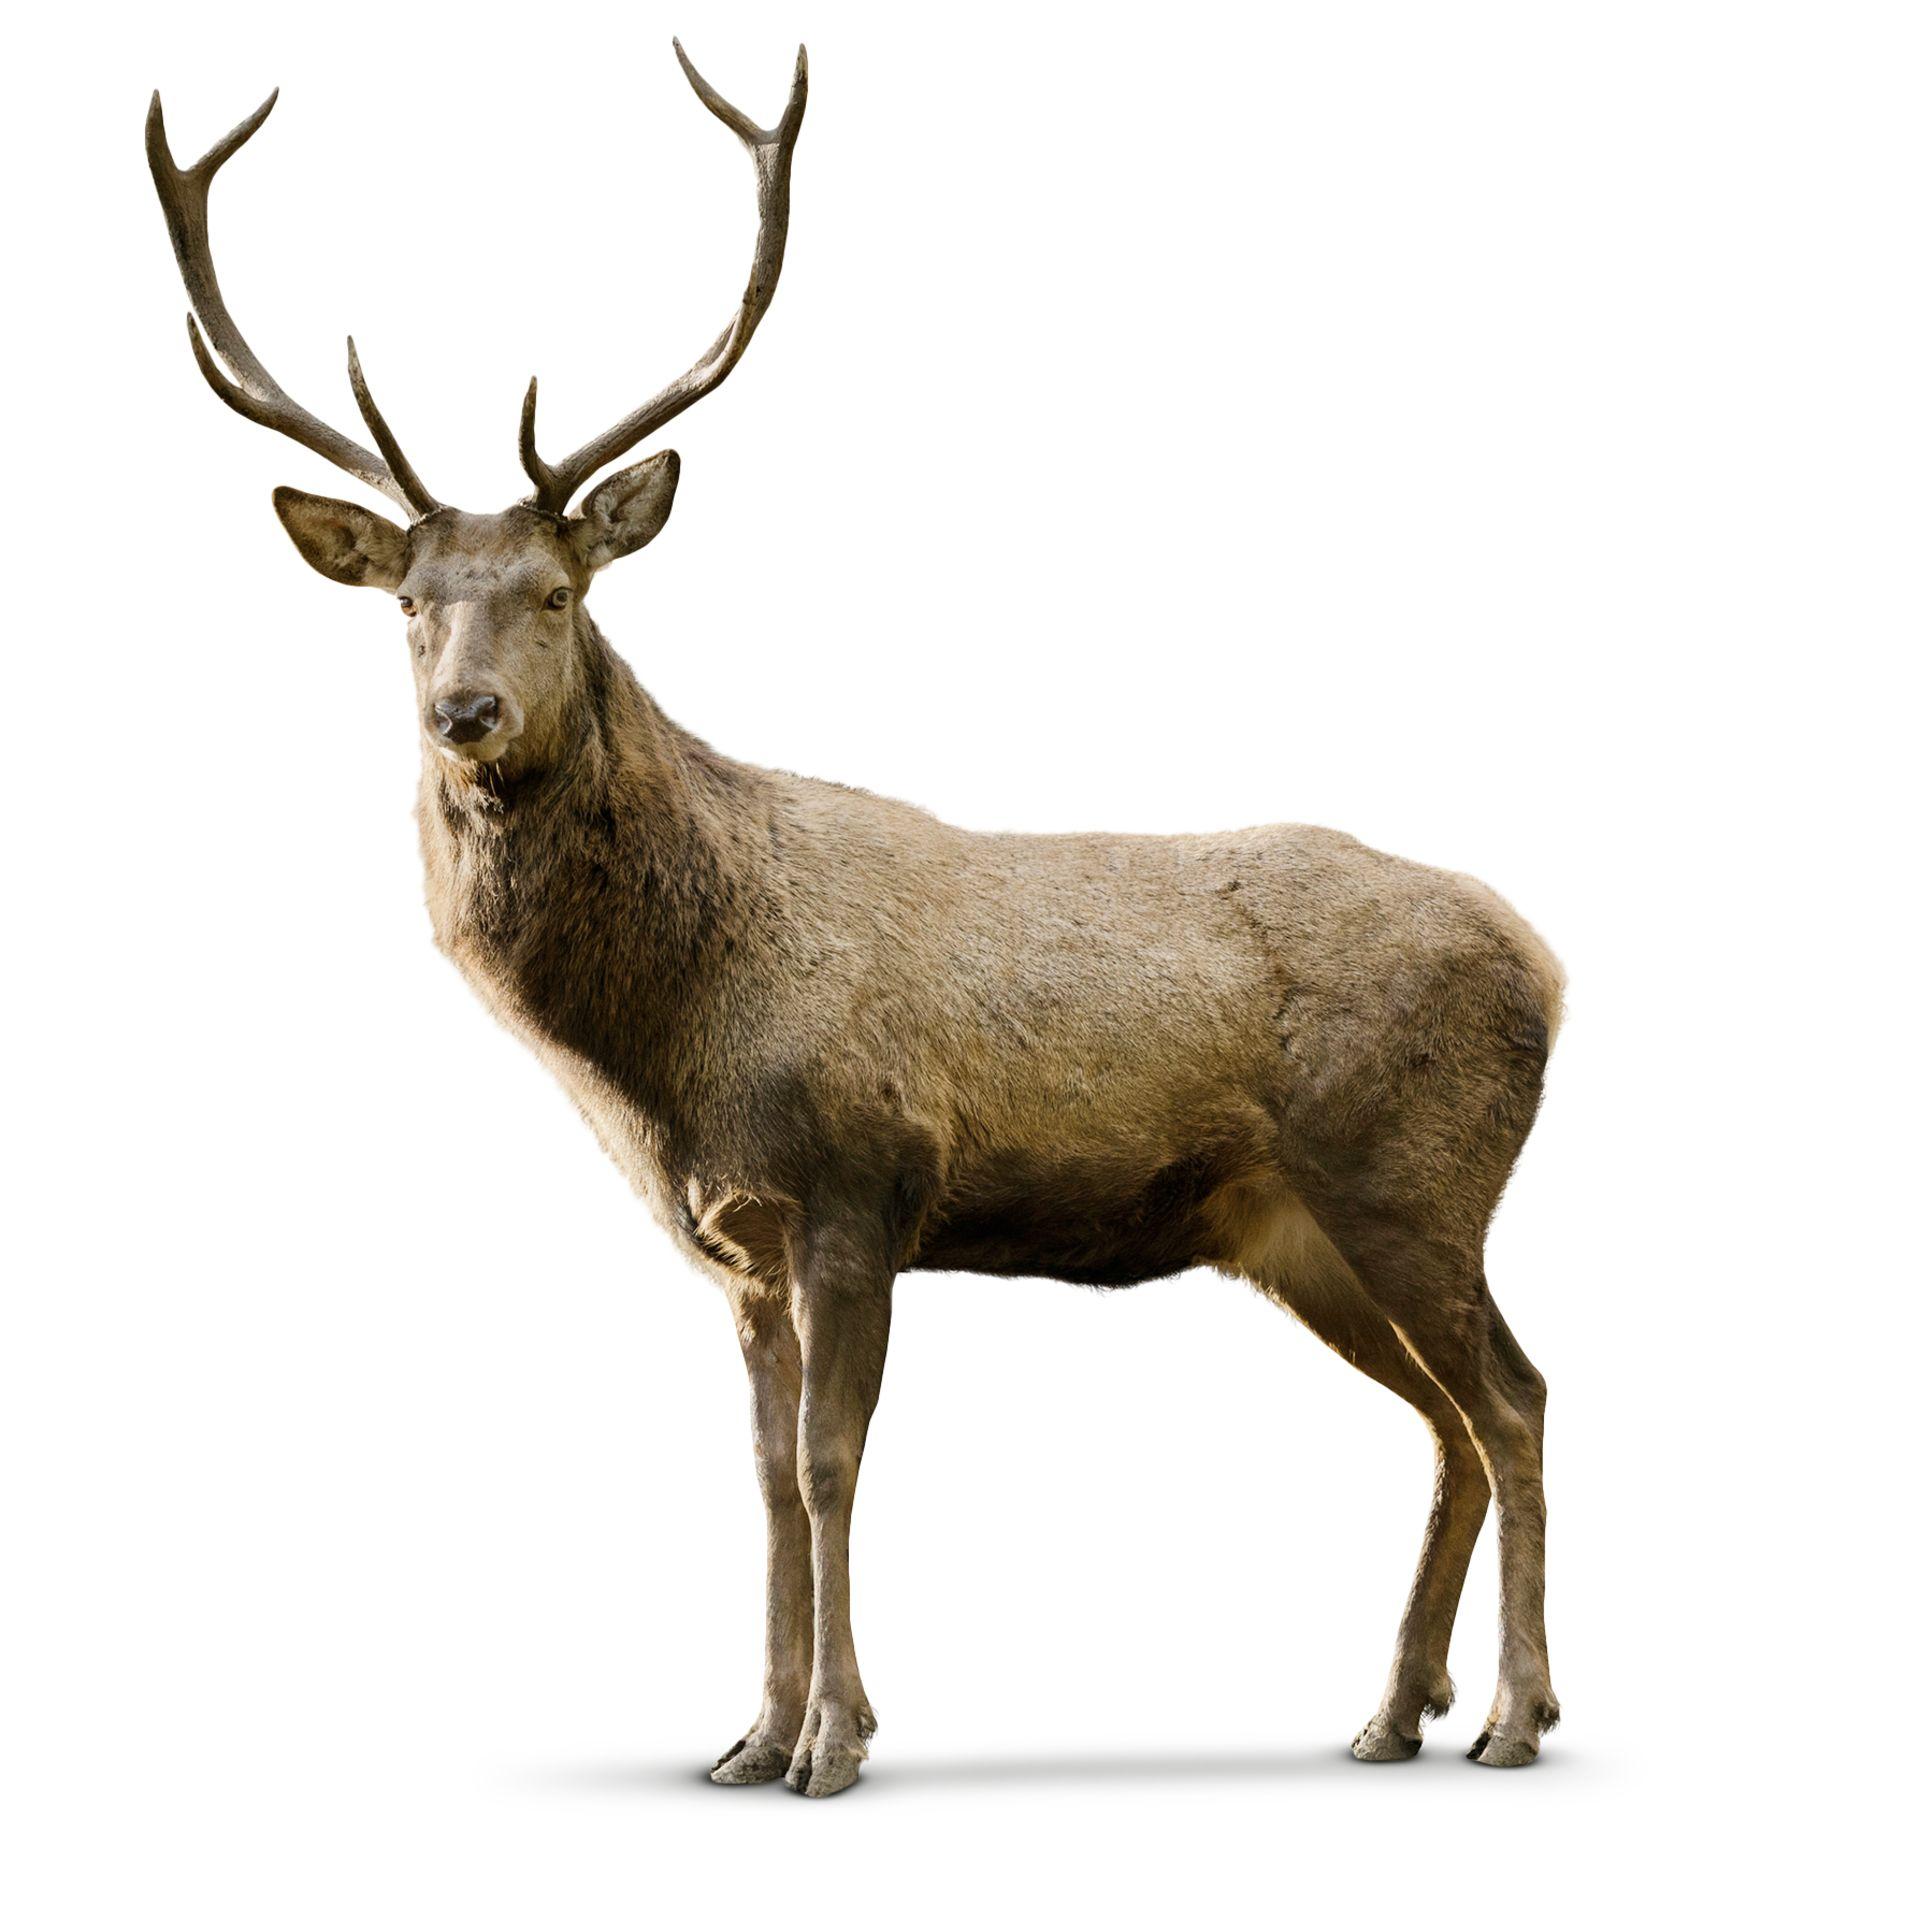 Deer photo